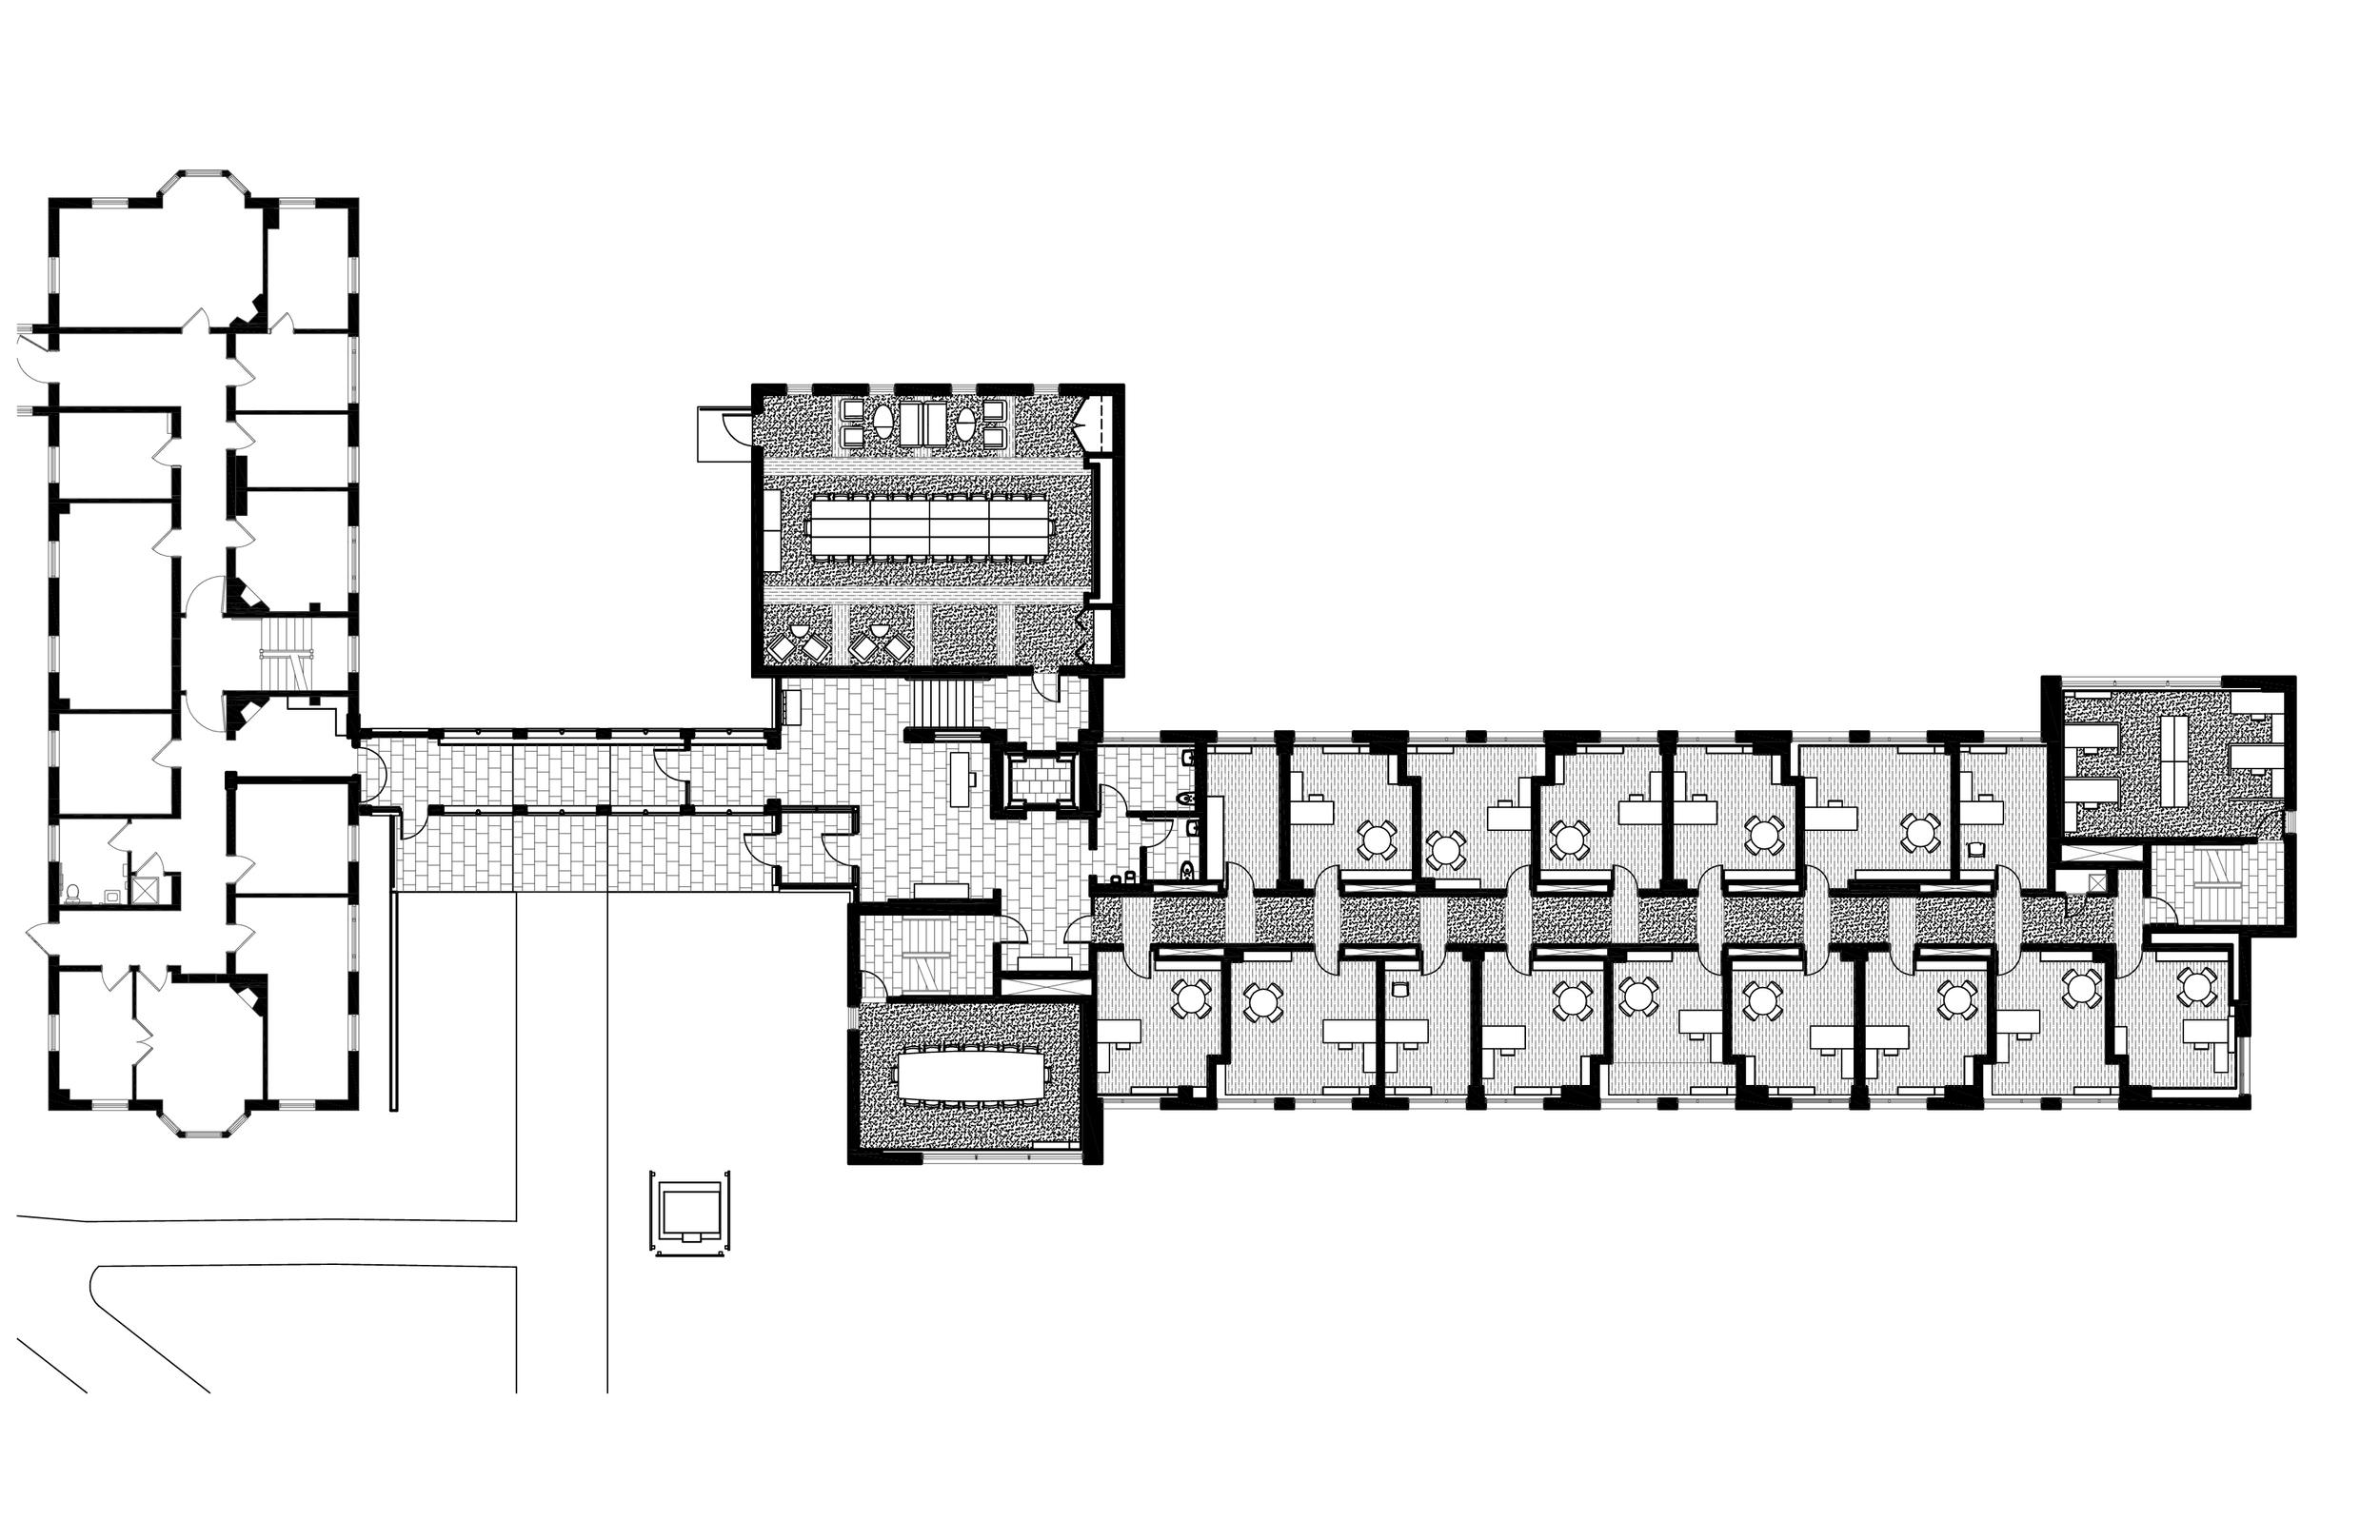 Buchanan Hall ground level plan